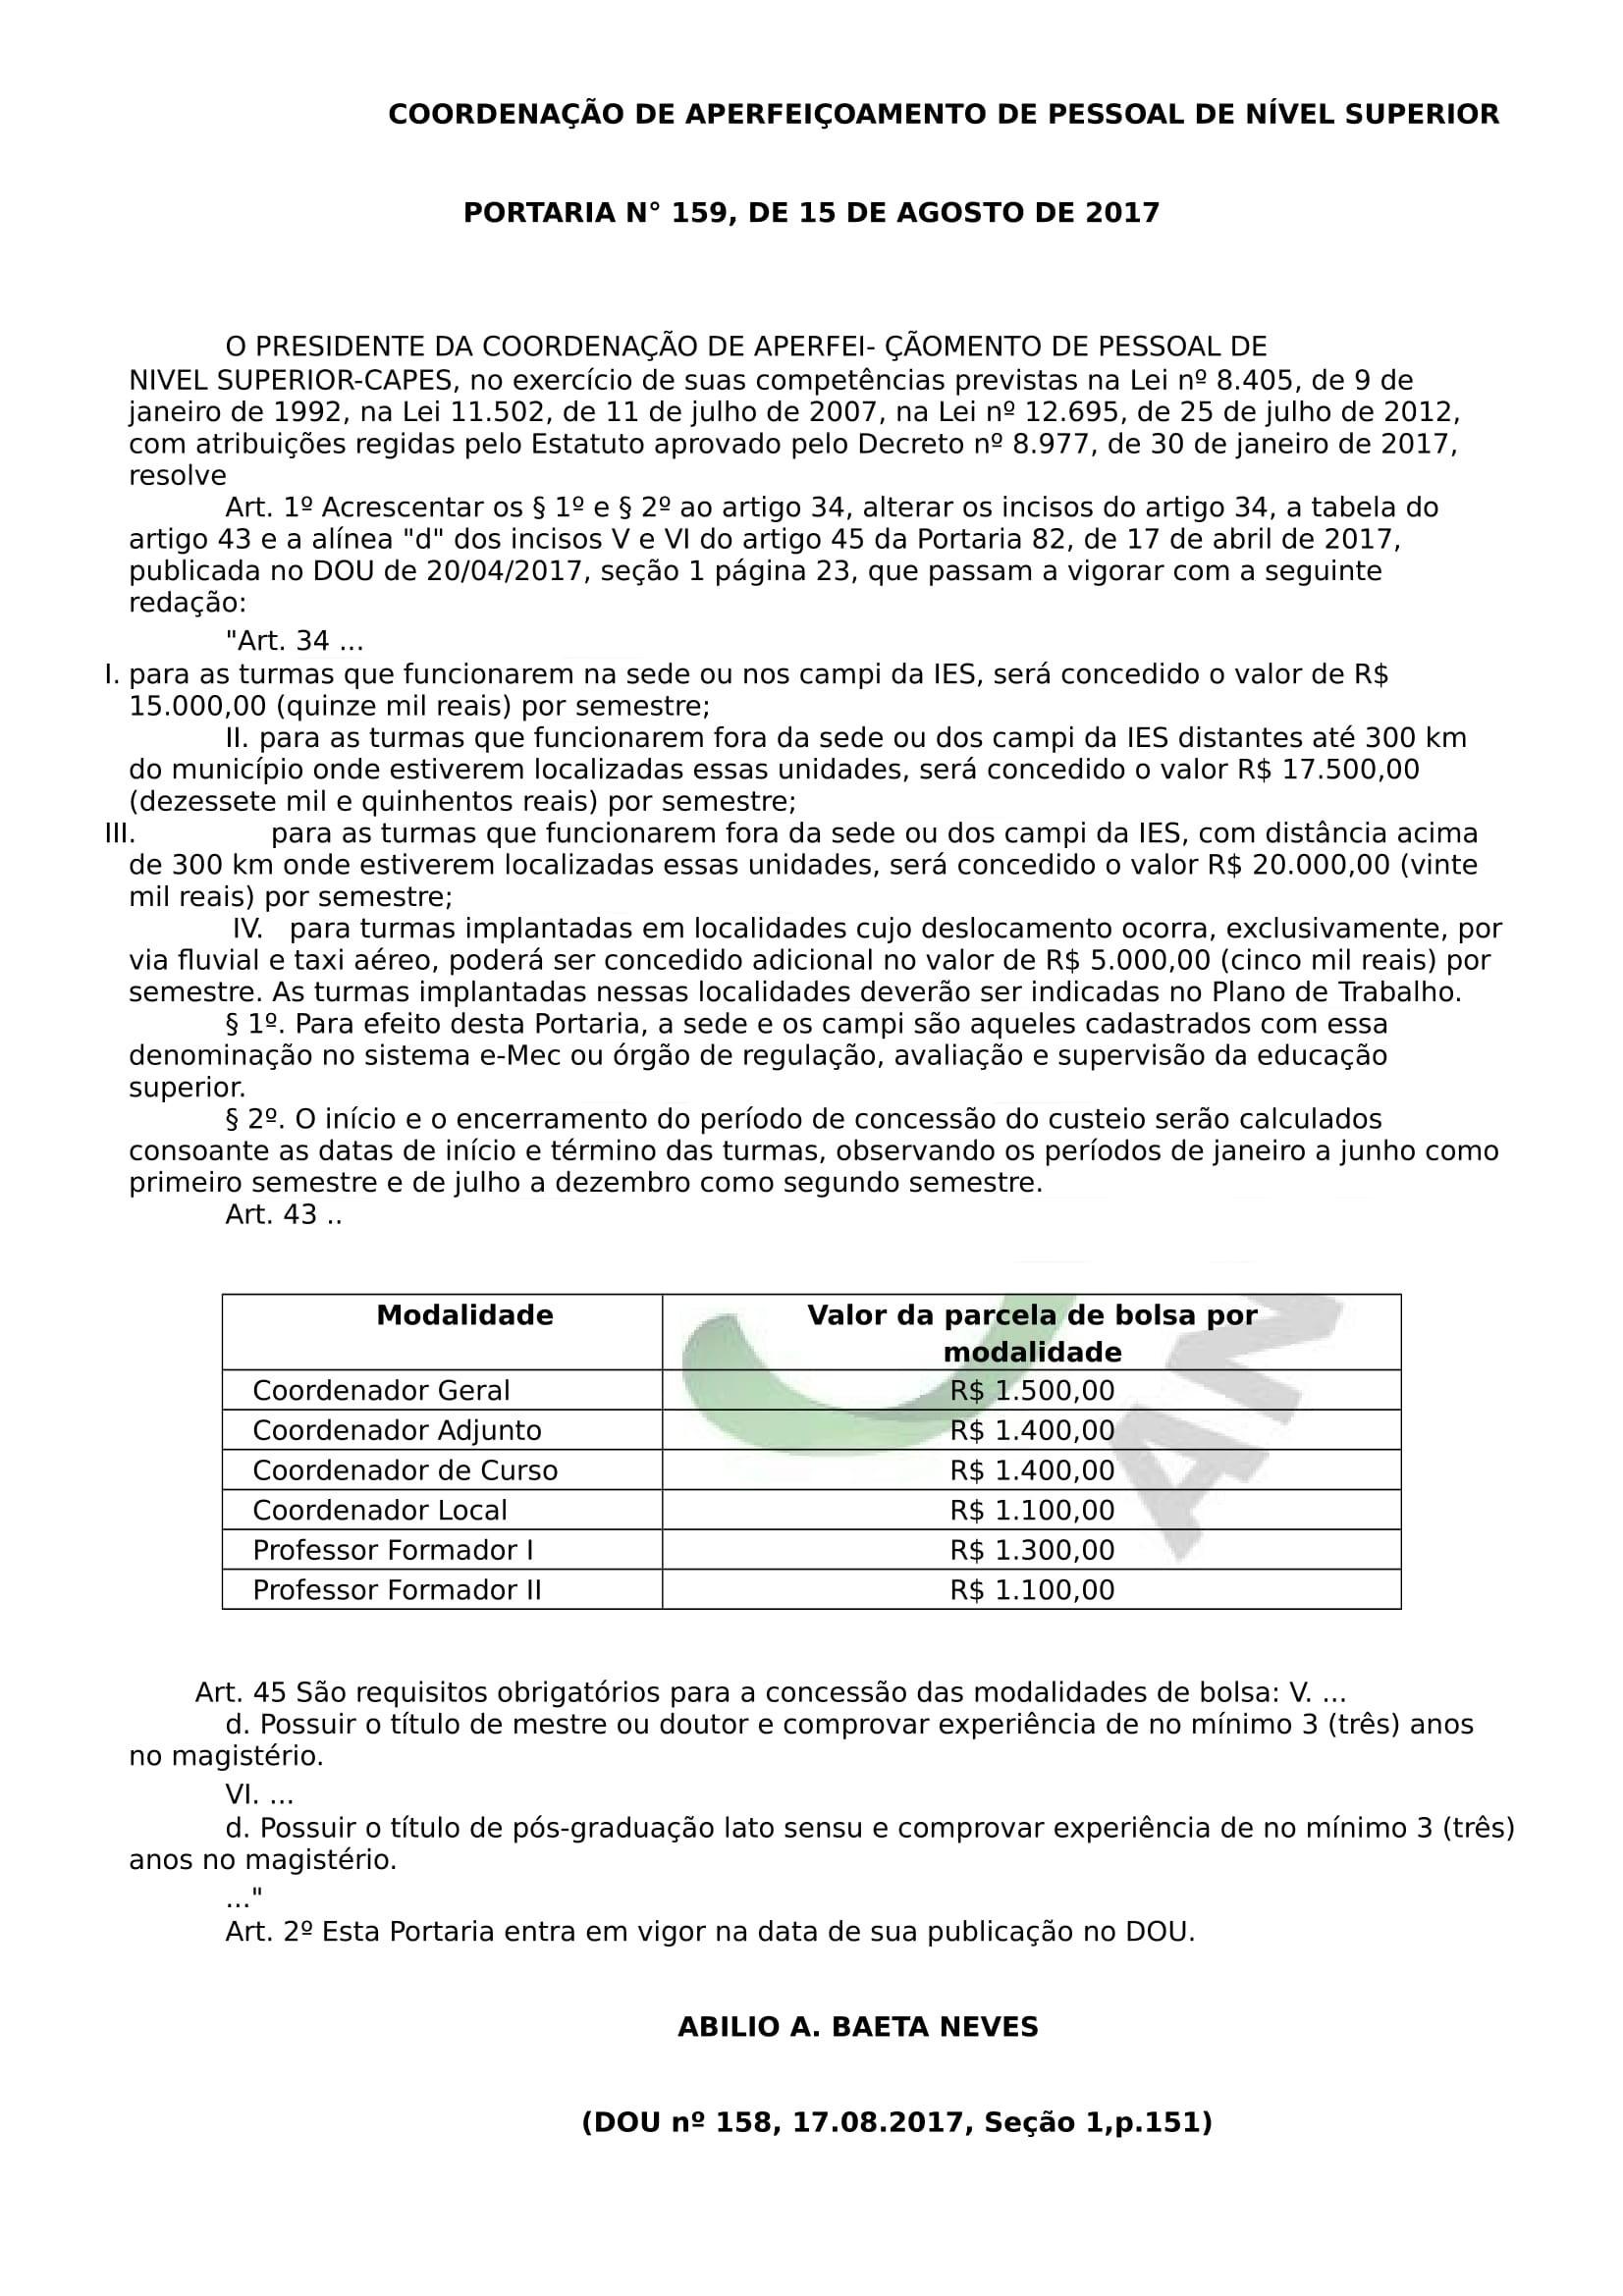 Portaria, n°159, de 15 de Agosto de 2017 - CAPES